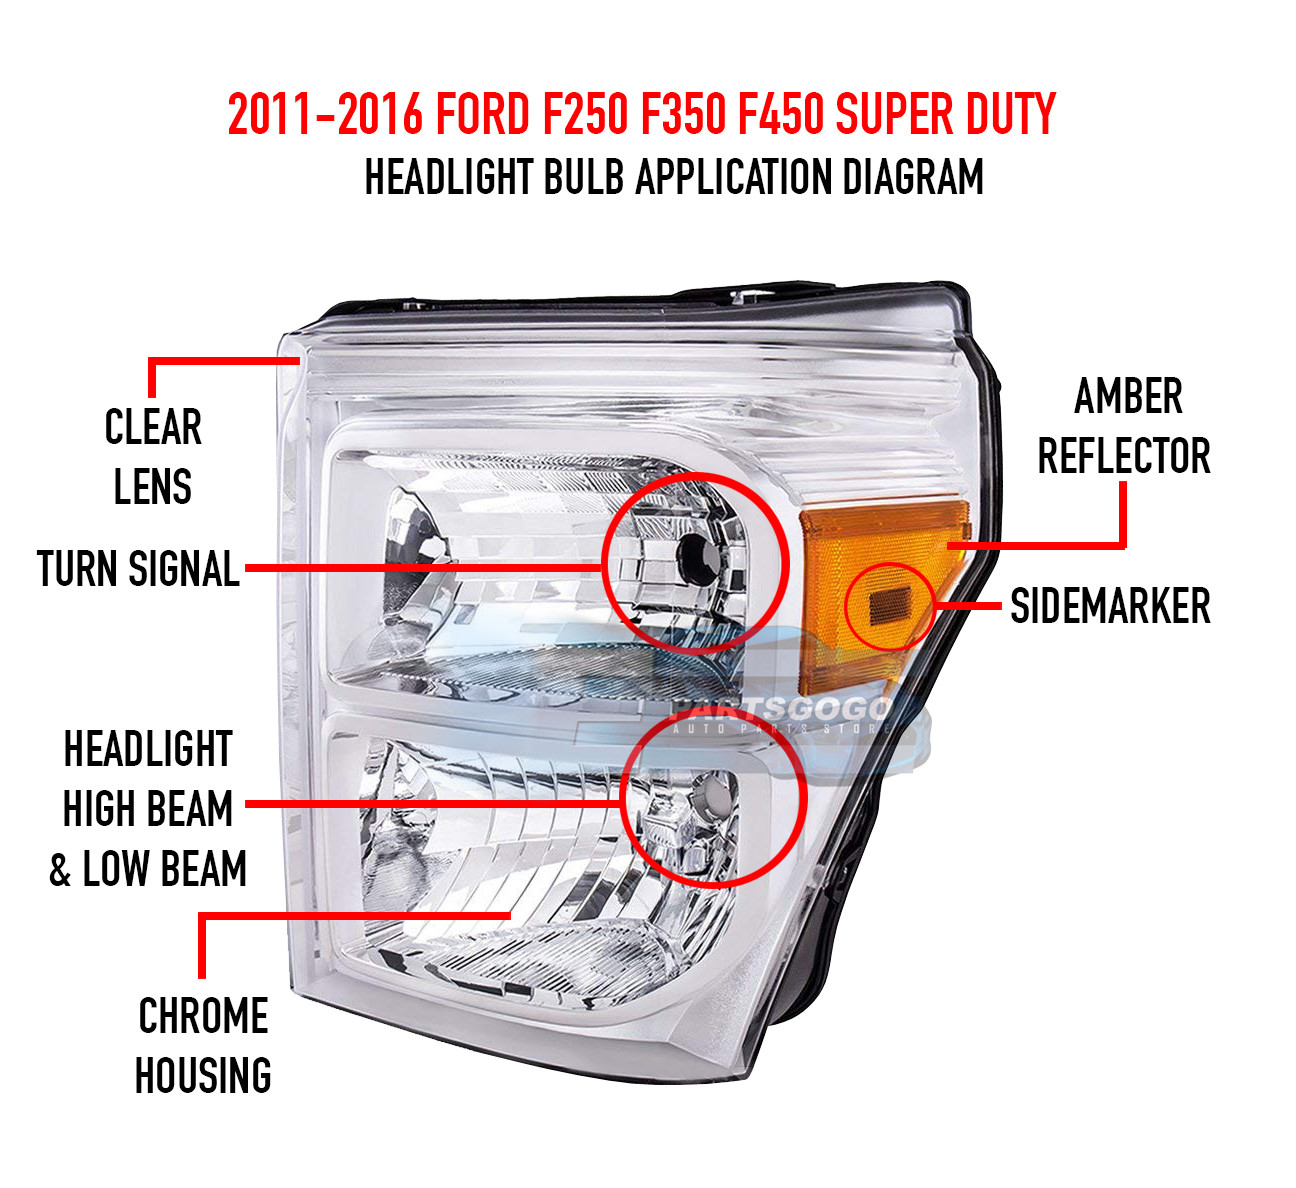 hight resolution of 11 16 ford f250 f350 f450 superduty chrome housing headlight amber reflector